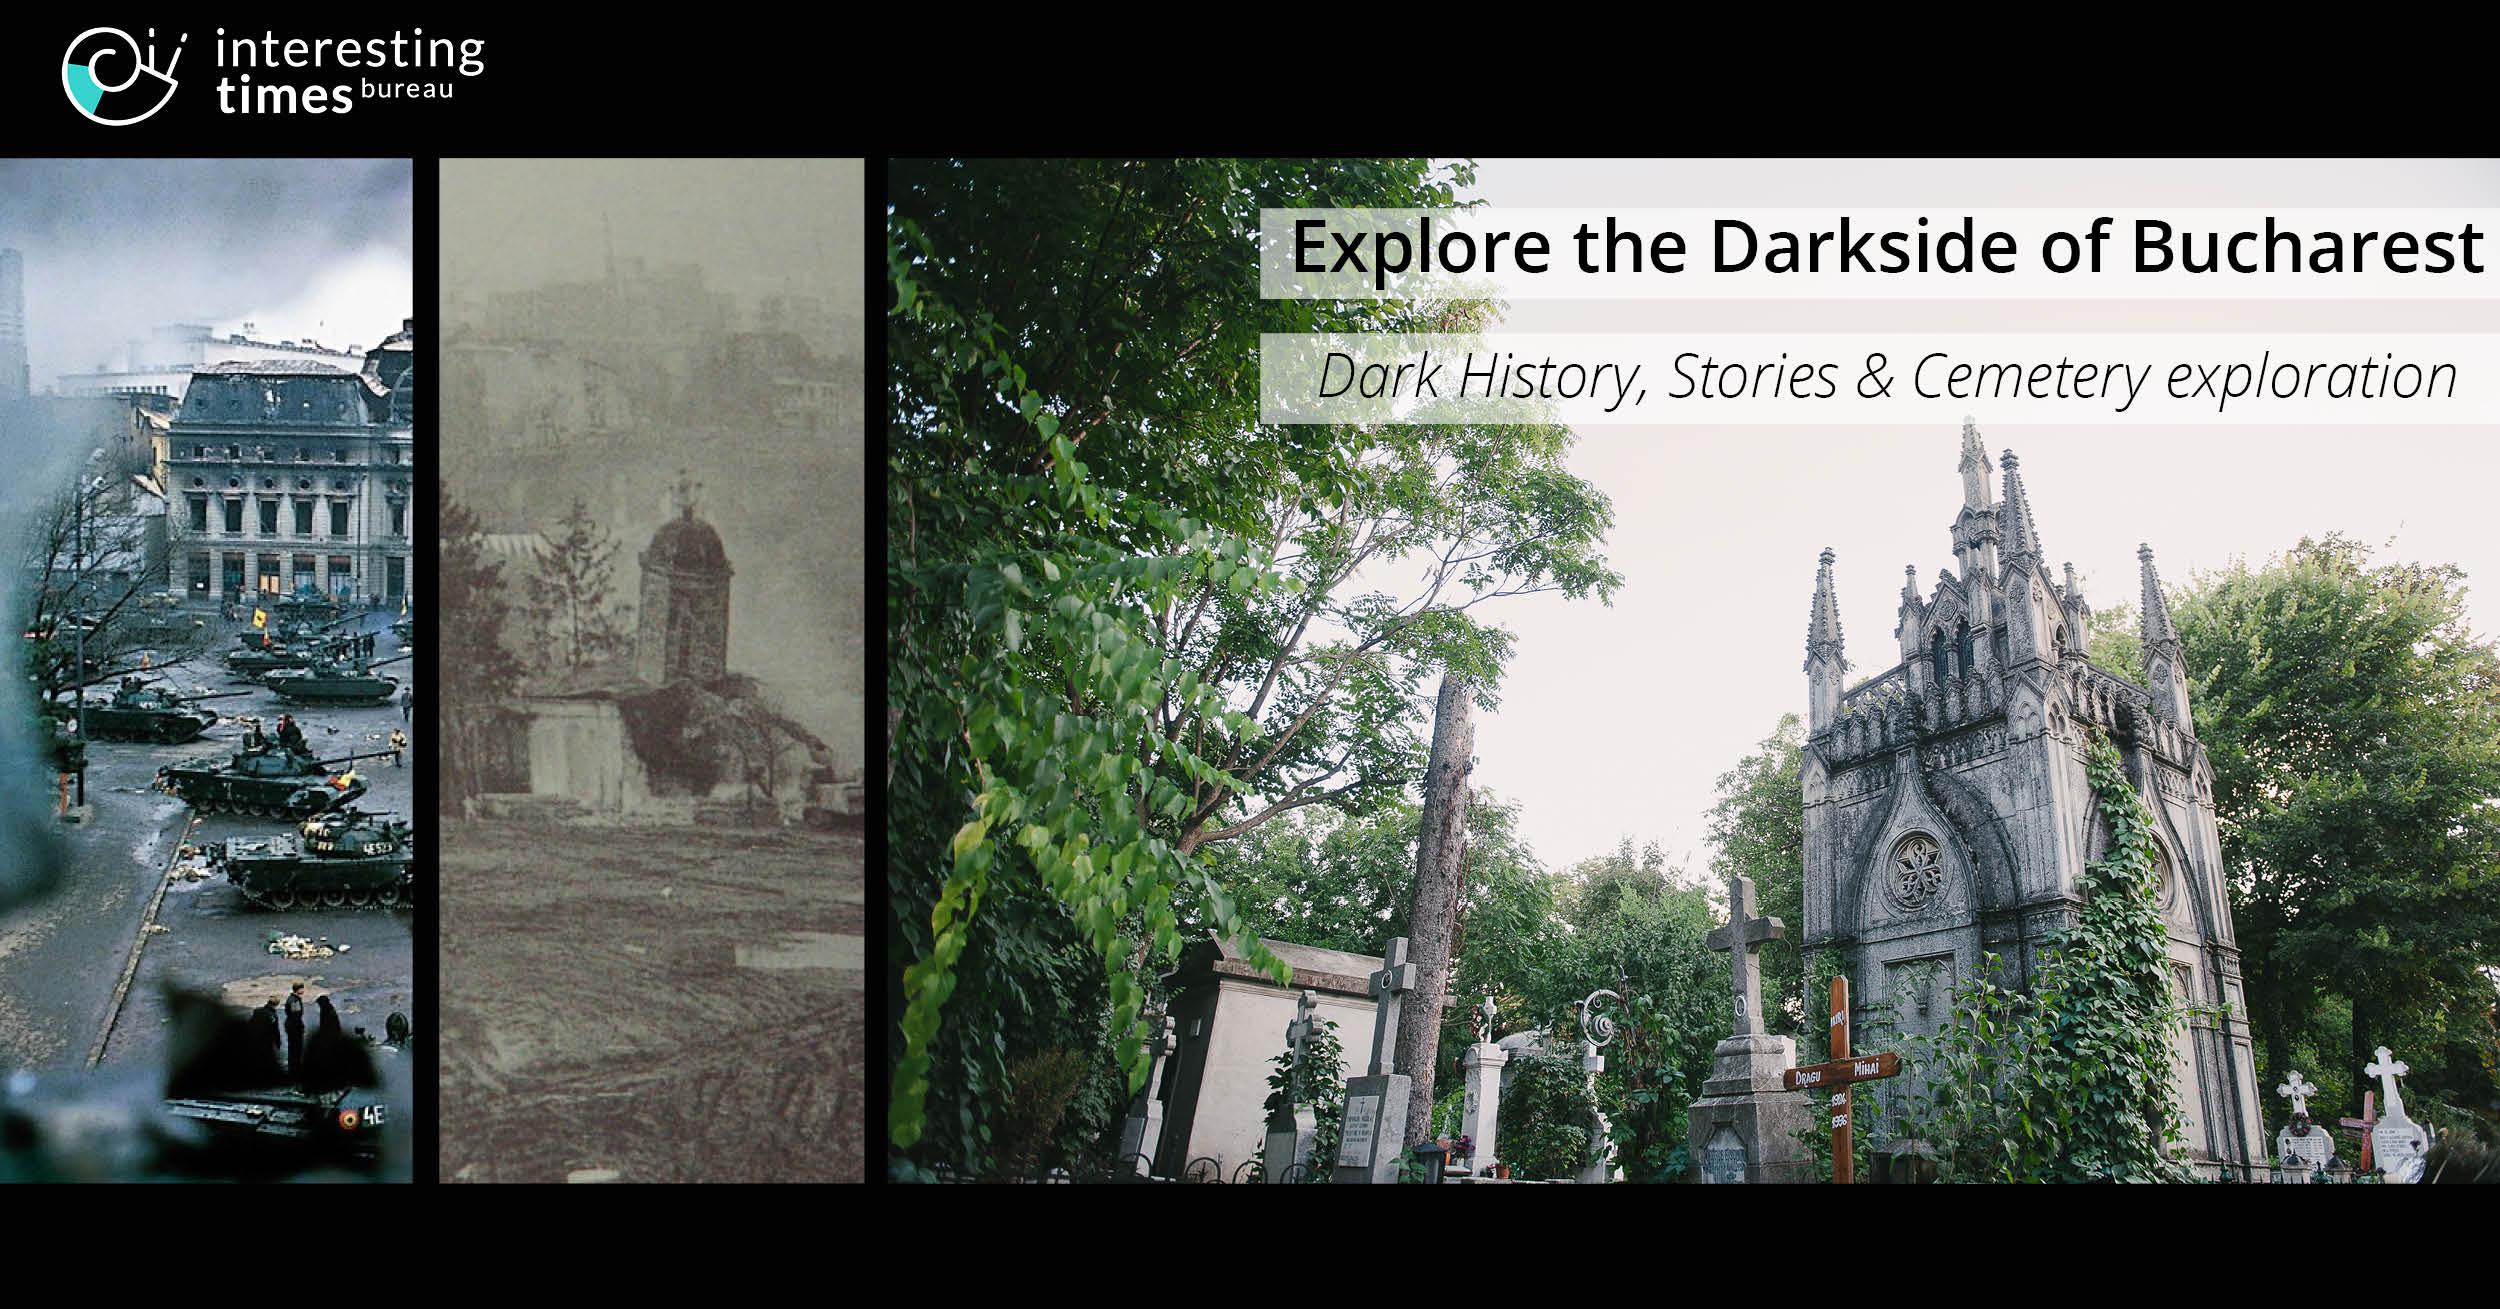 Darkside Tour - Romania's Dark Past and Bellu Cemetery Visit